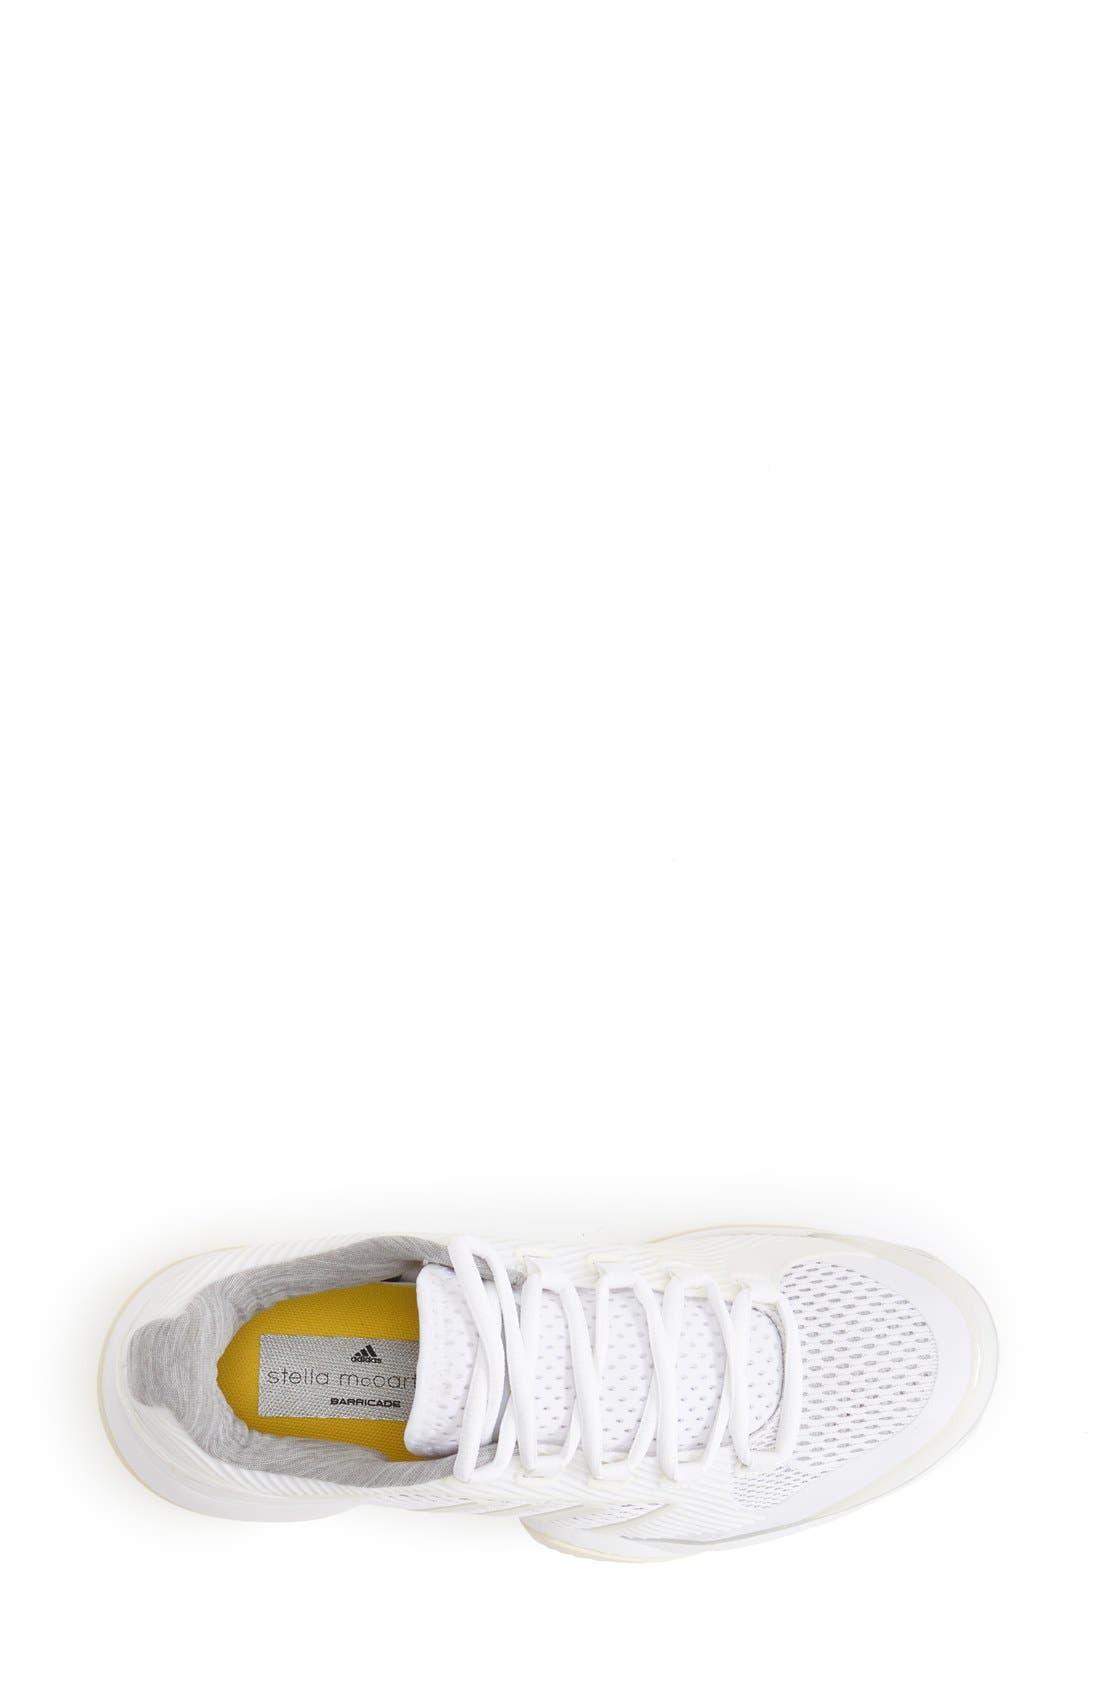 Alternate Image 3  - adidas 'Stella McCartney - Barricade 2015' Tennis Shoe (Women)